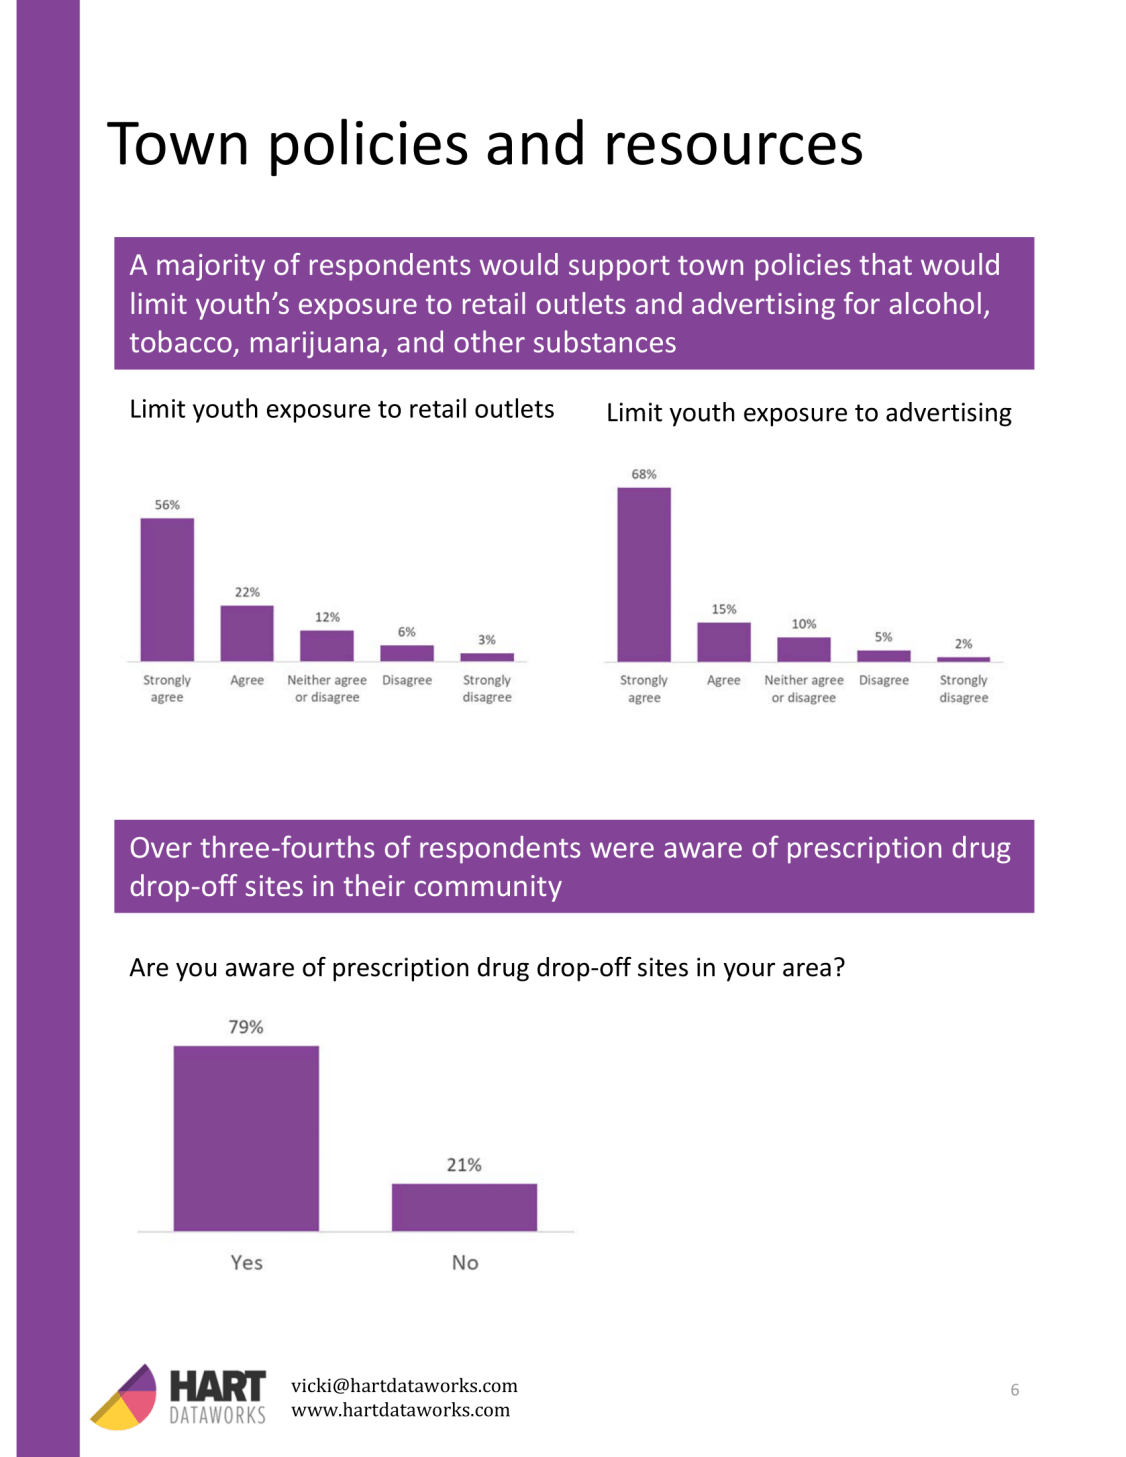 ACT 2019 Community Survey_updated-6